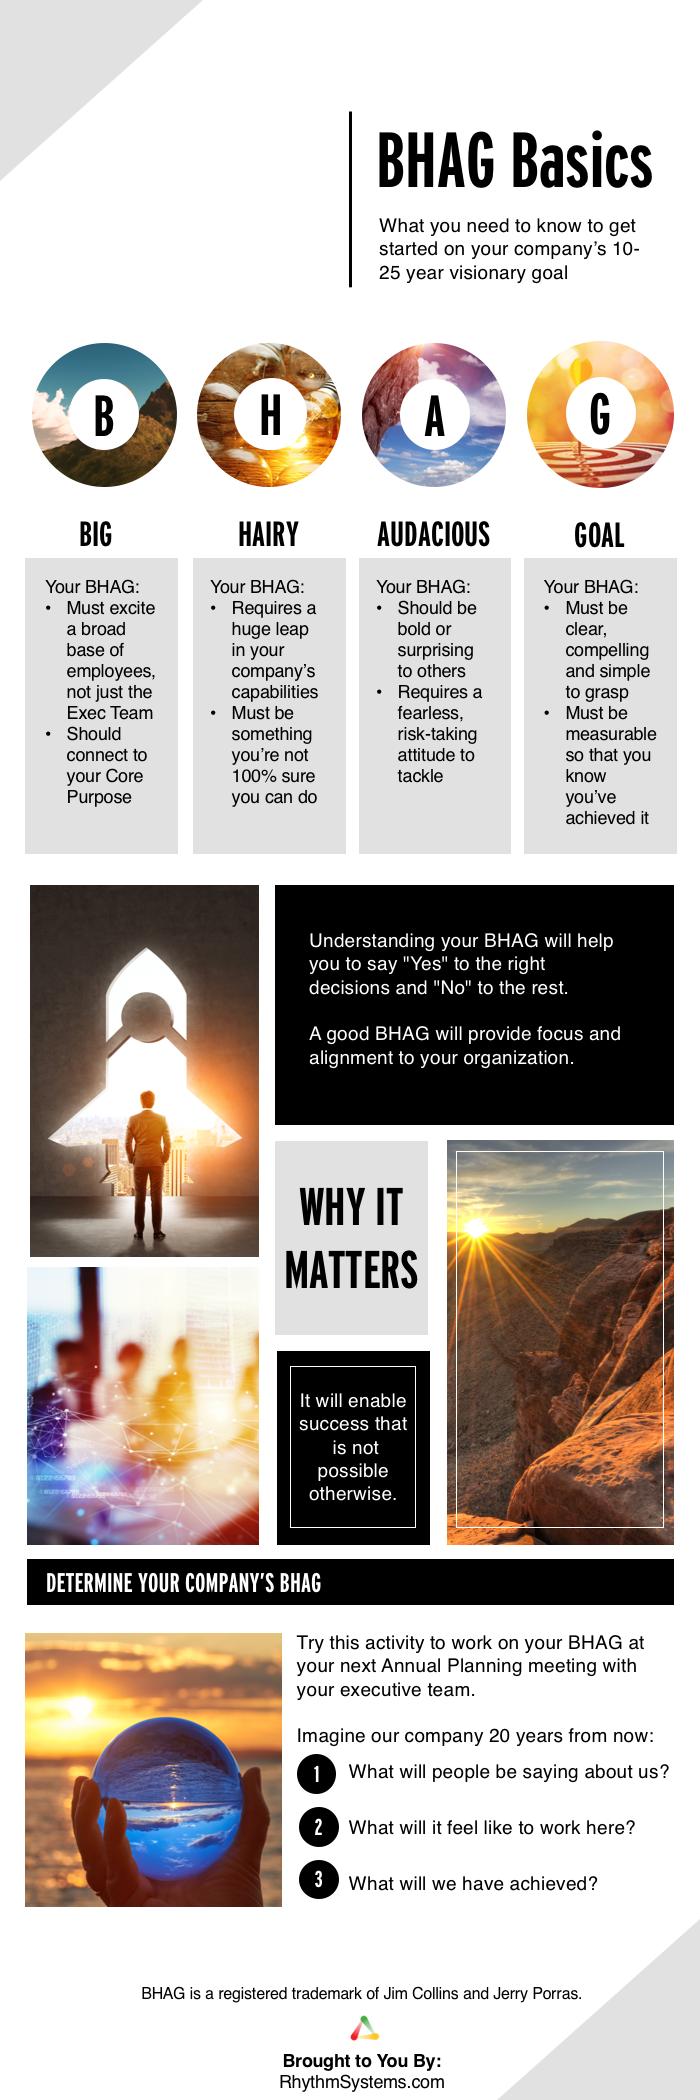 BHAG Basics Infographic